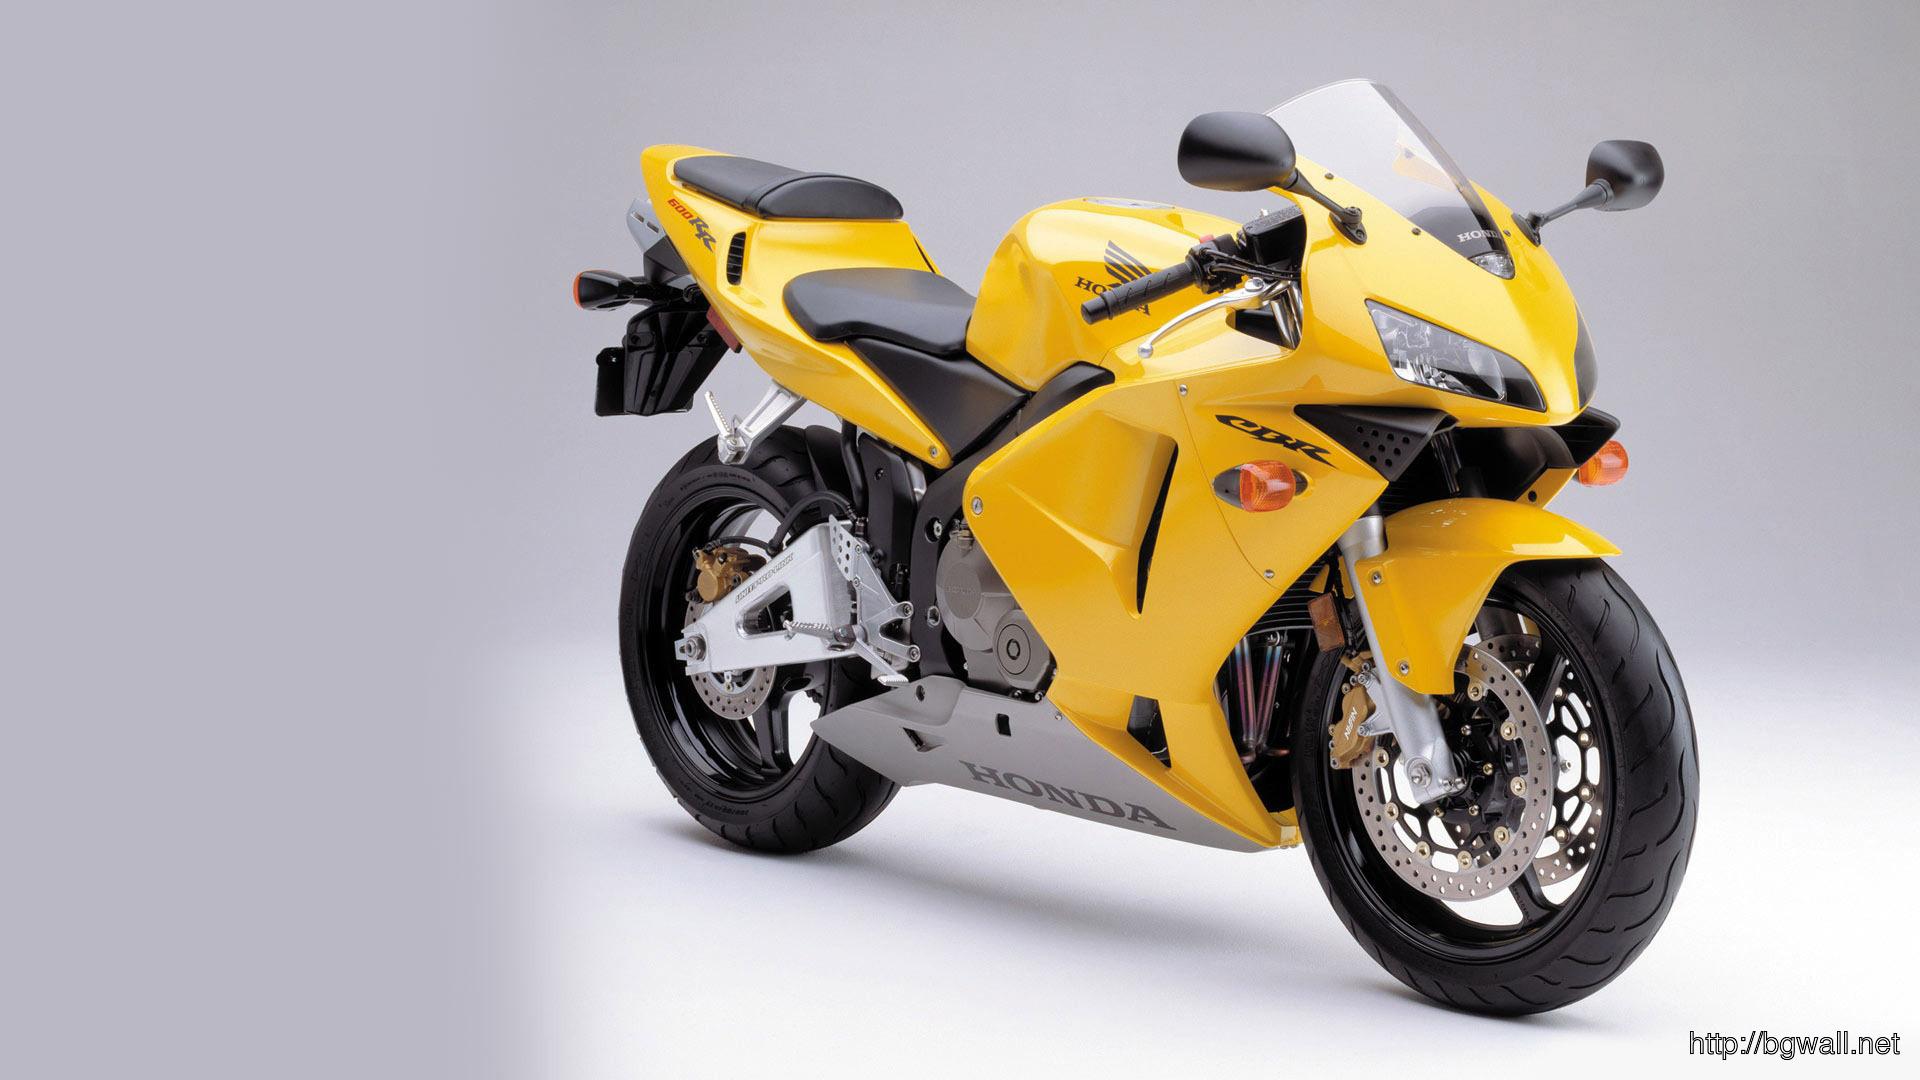 Honda Cbr 600rr Wallpaper   Yellow Colour Sports Bike 1004631 1920x1080